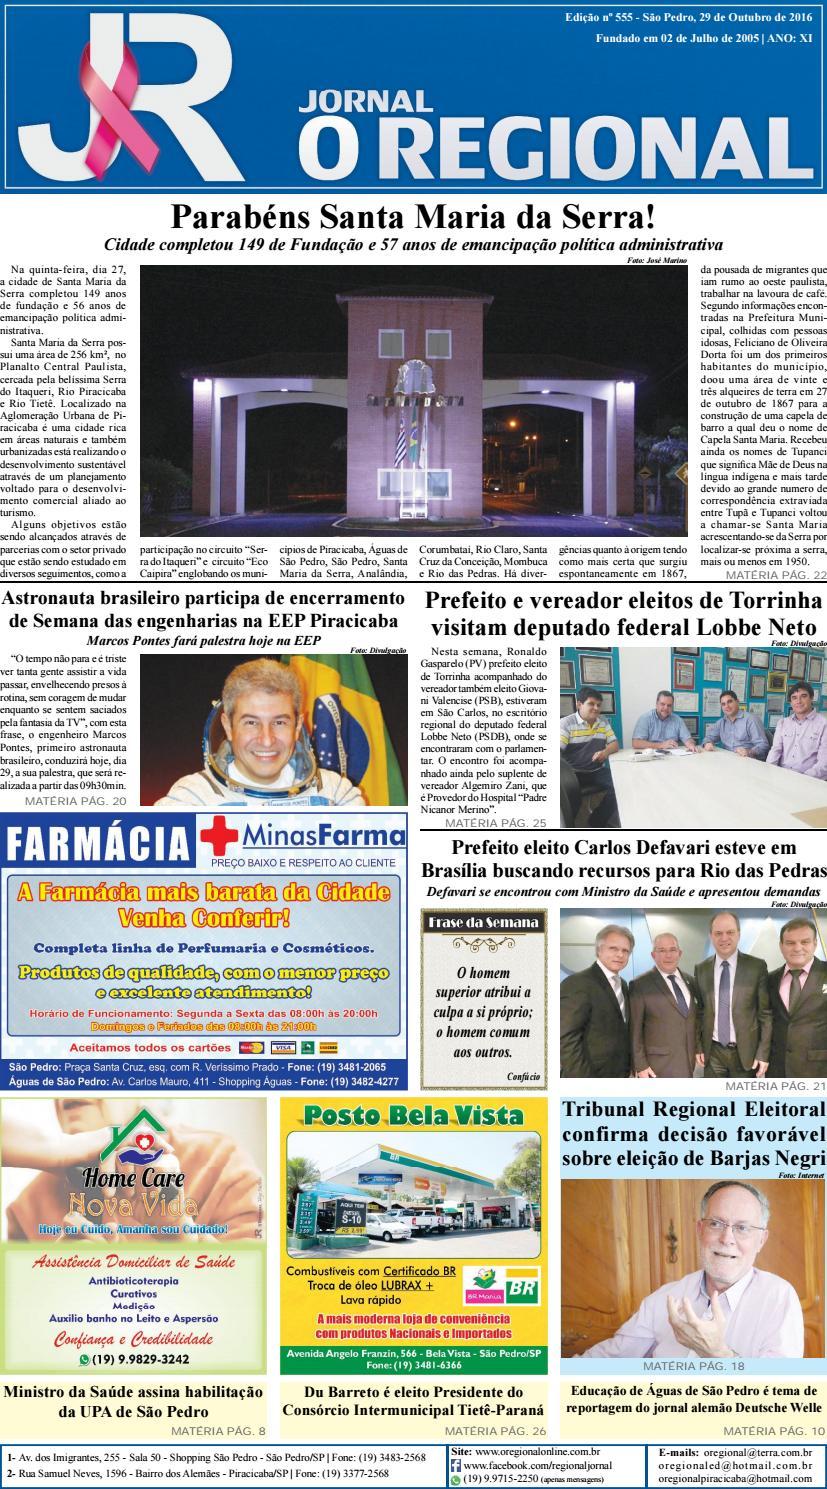 ba0f82596 Jornal o regional edição 555 29 10 2016 site by Jornal O Regional - issuu